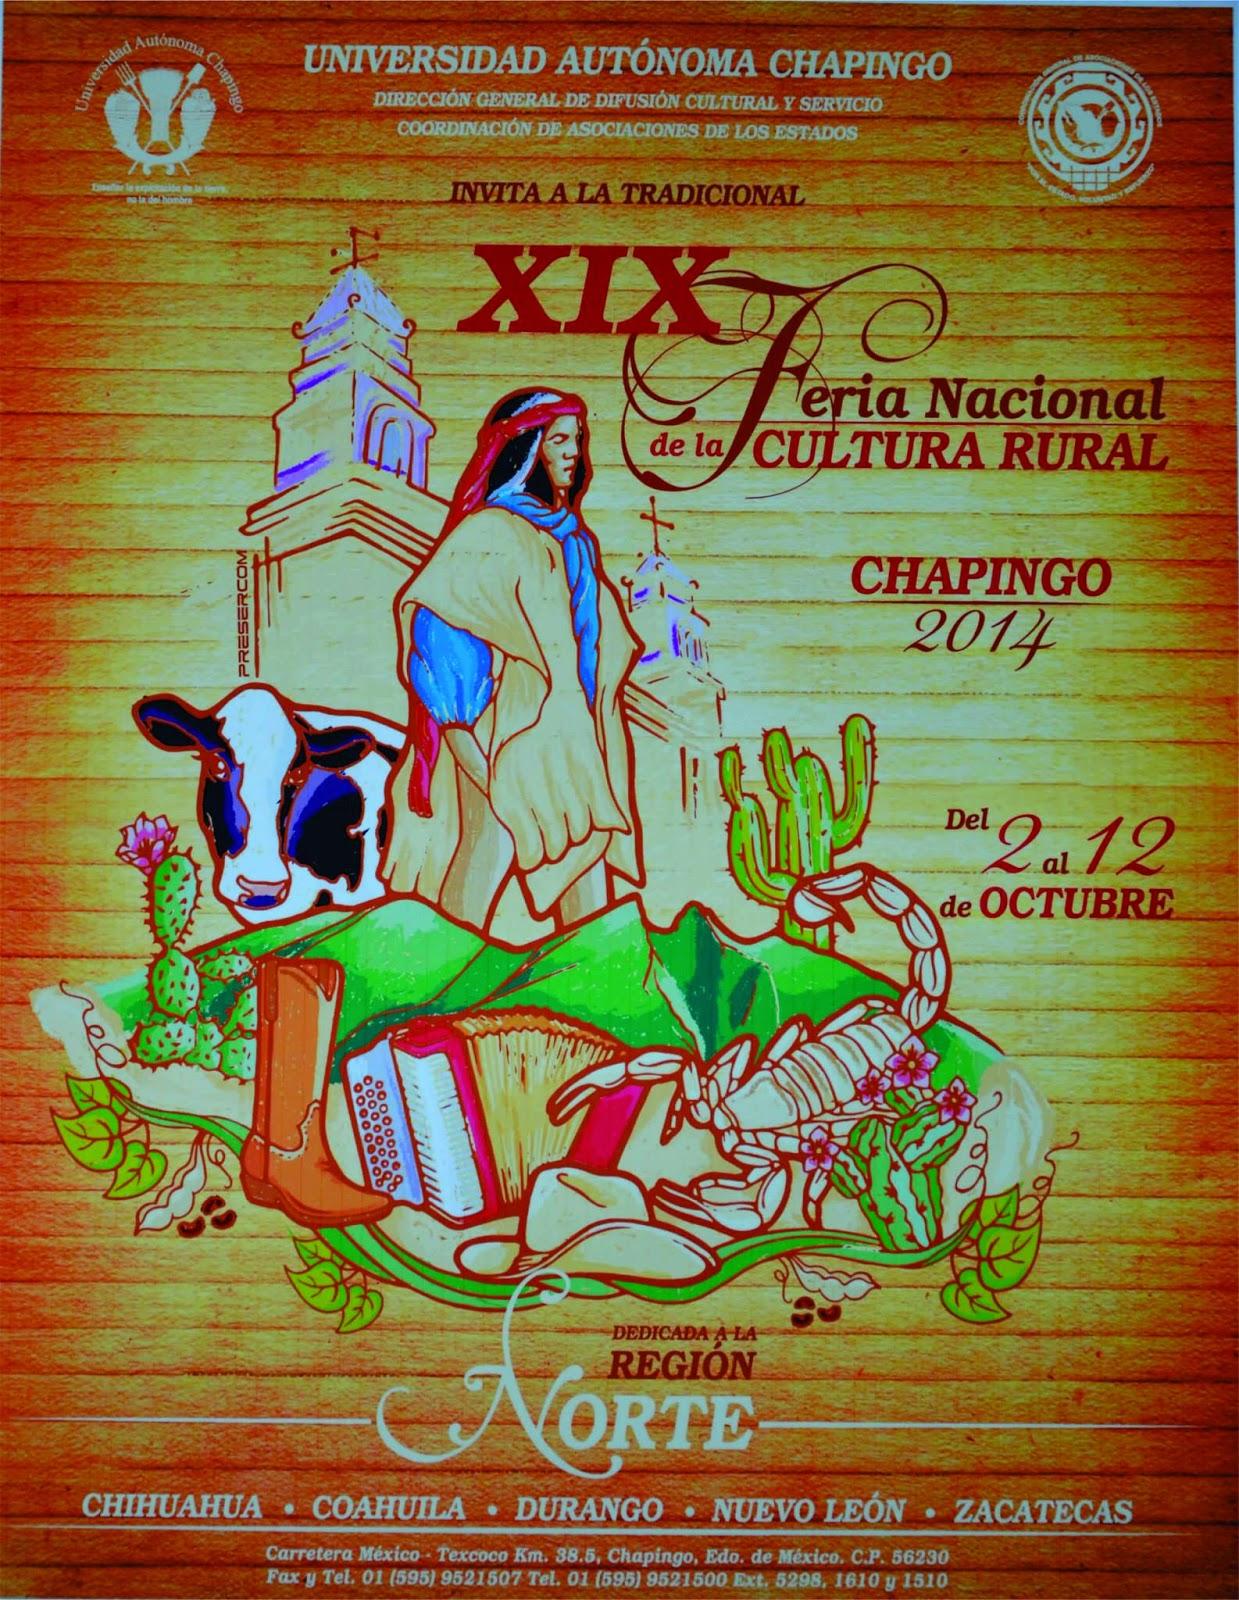 Chapingo 2014